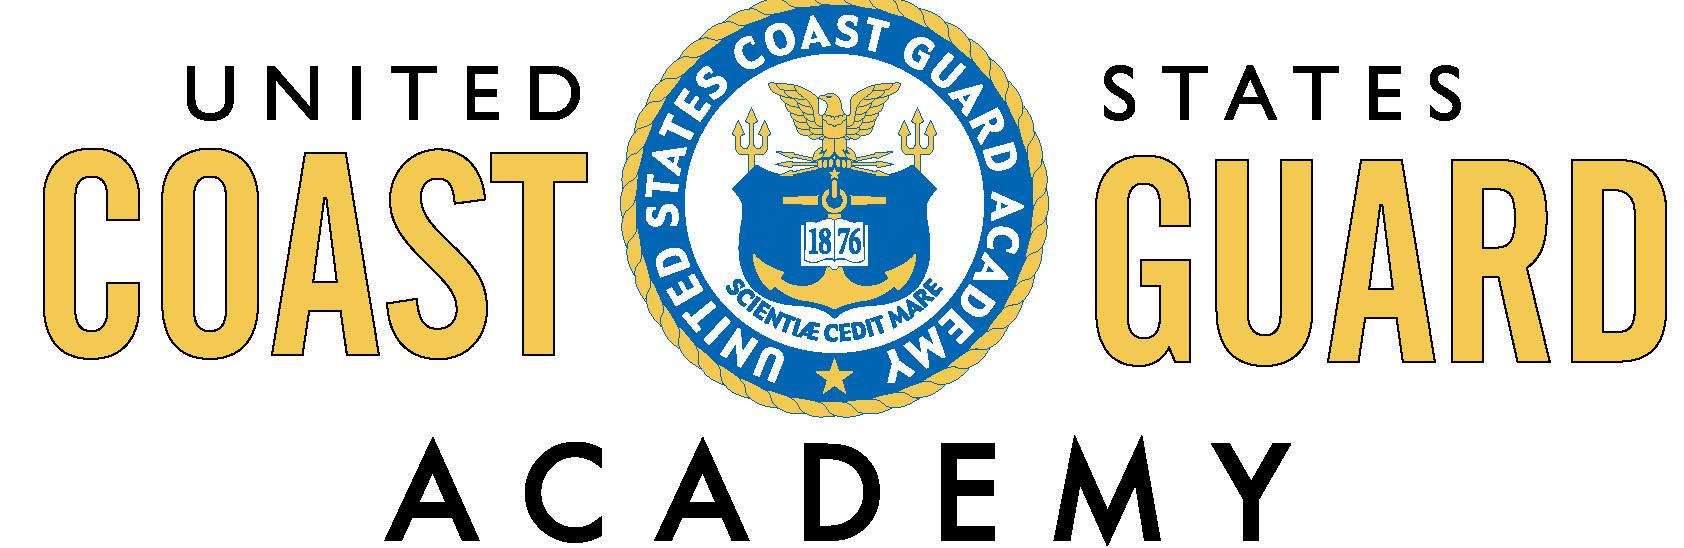 MilArt.com: United States Coast Guard